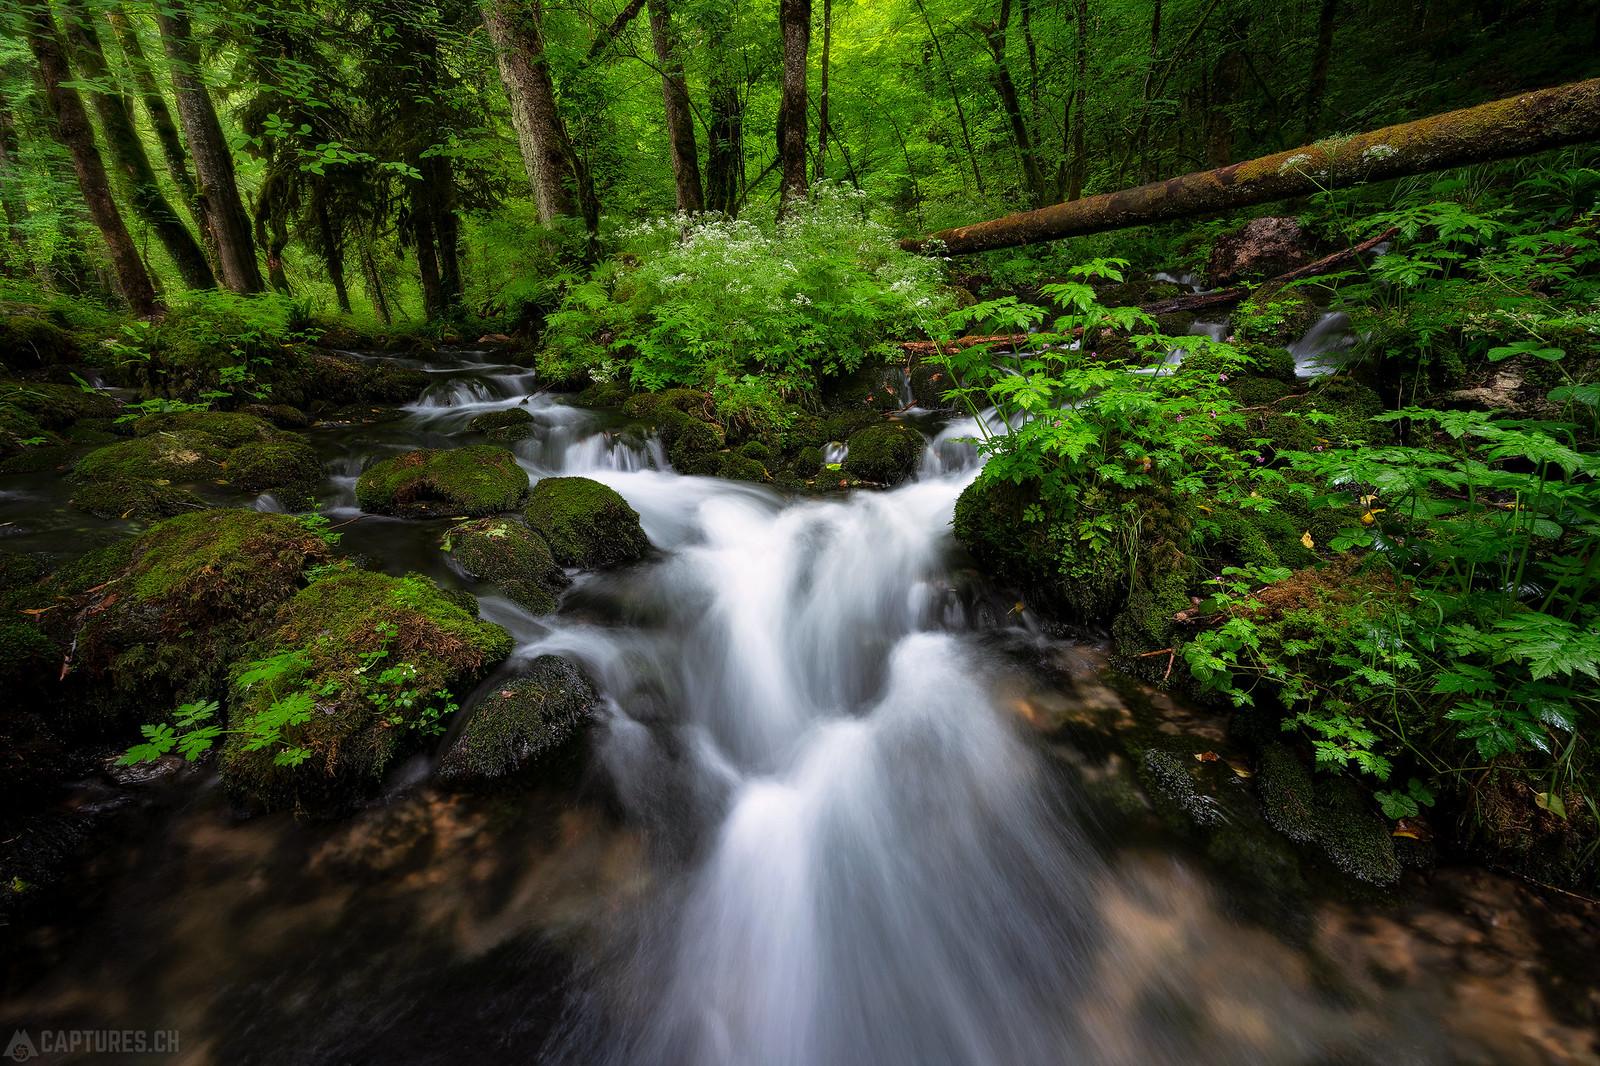 Green velvet - Gorges du Pichoux